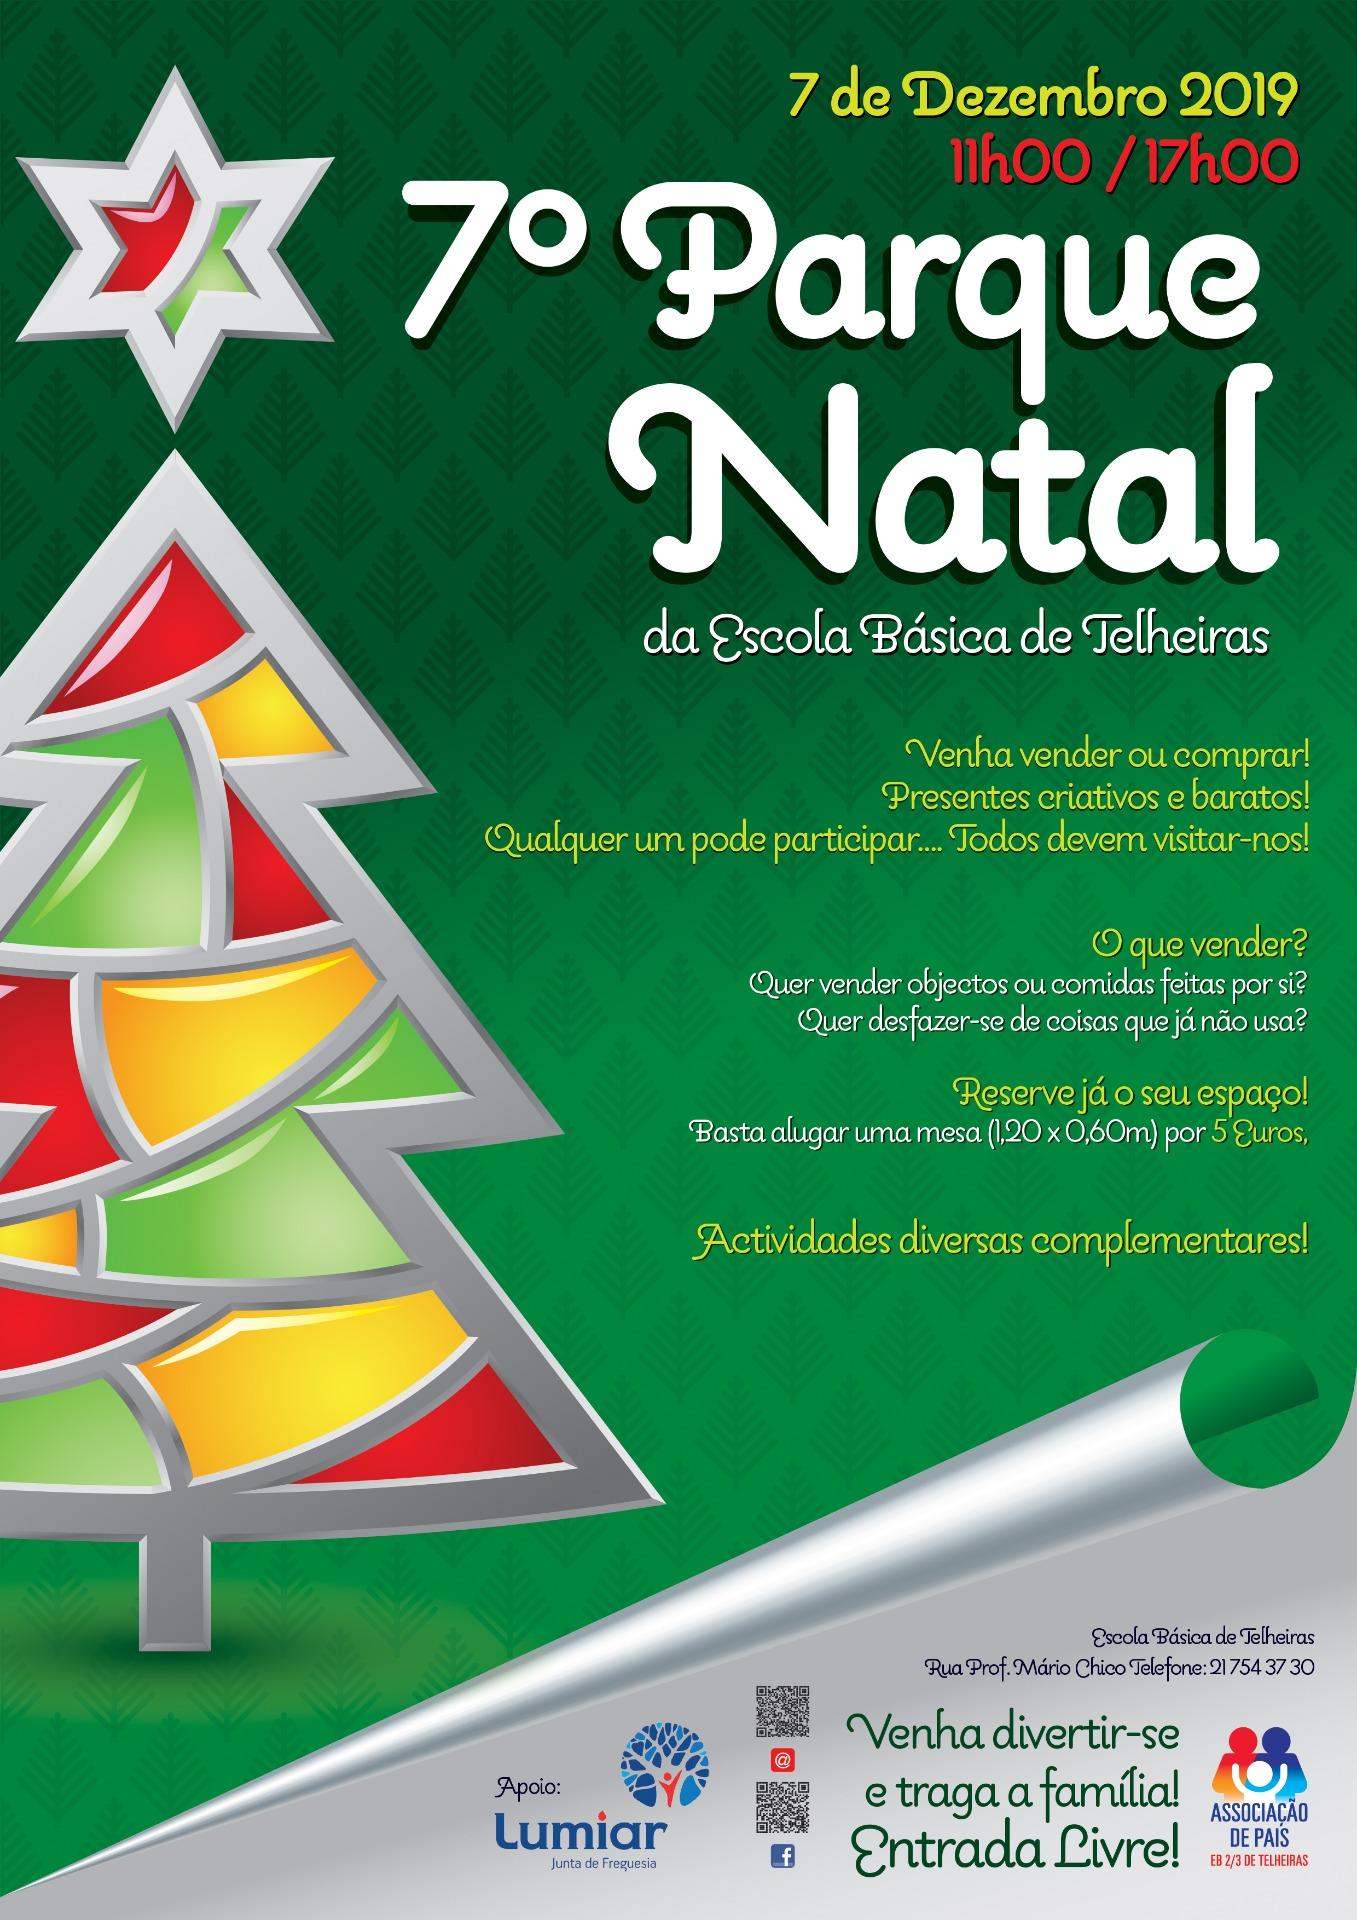 EB Telheiras Parque Natal 2019